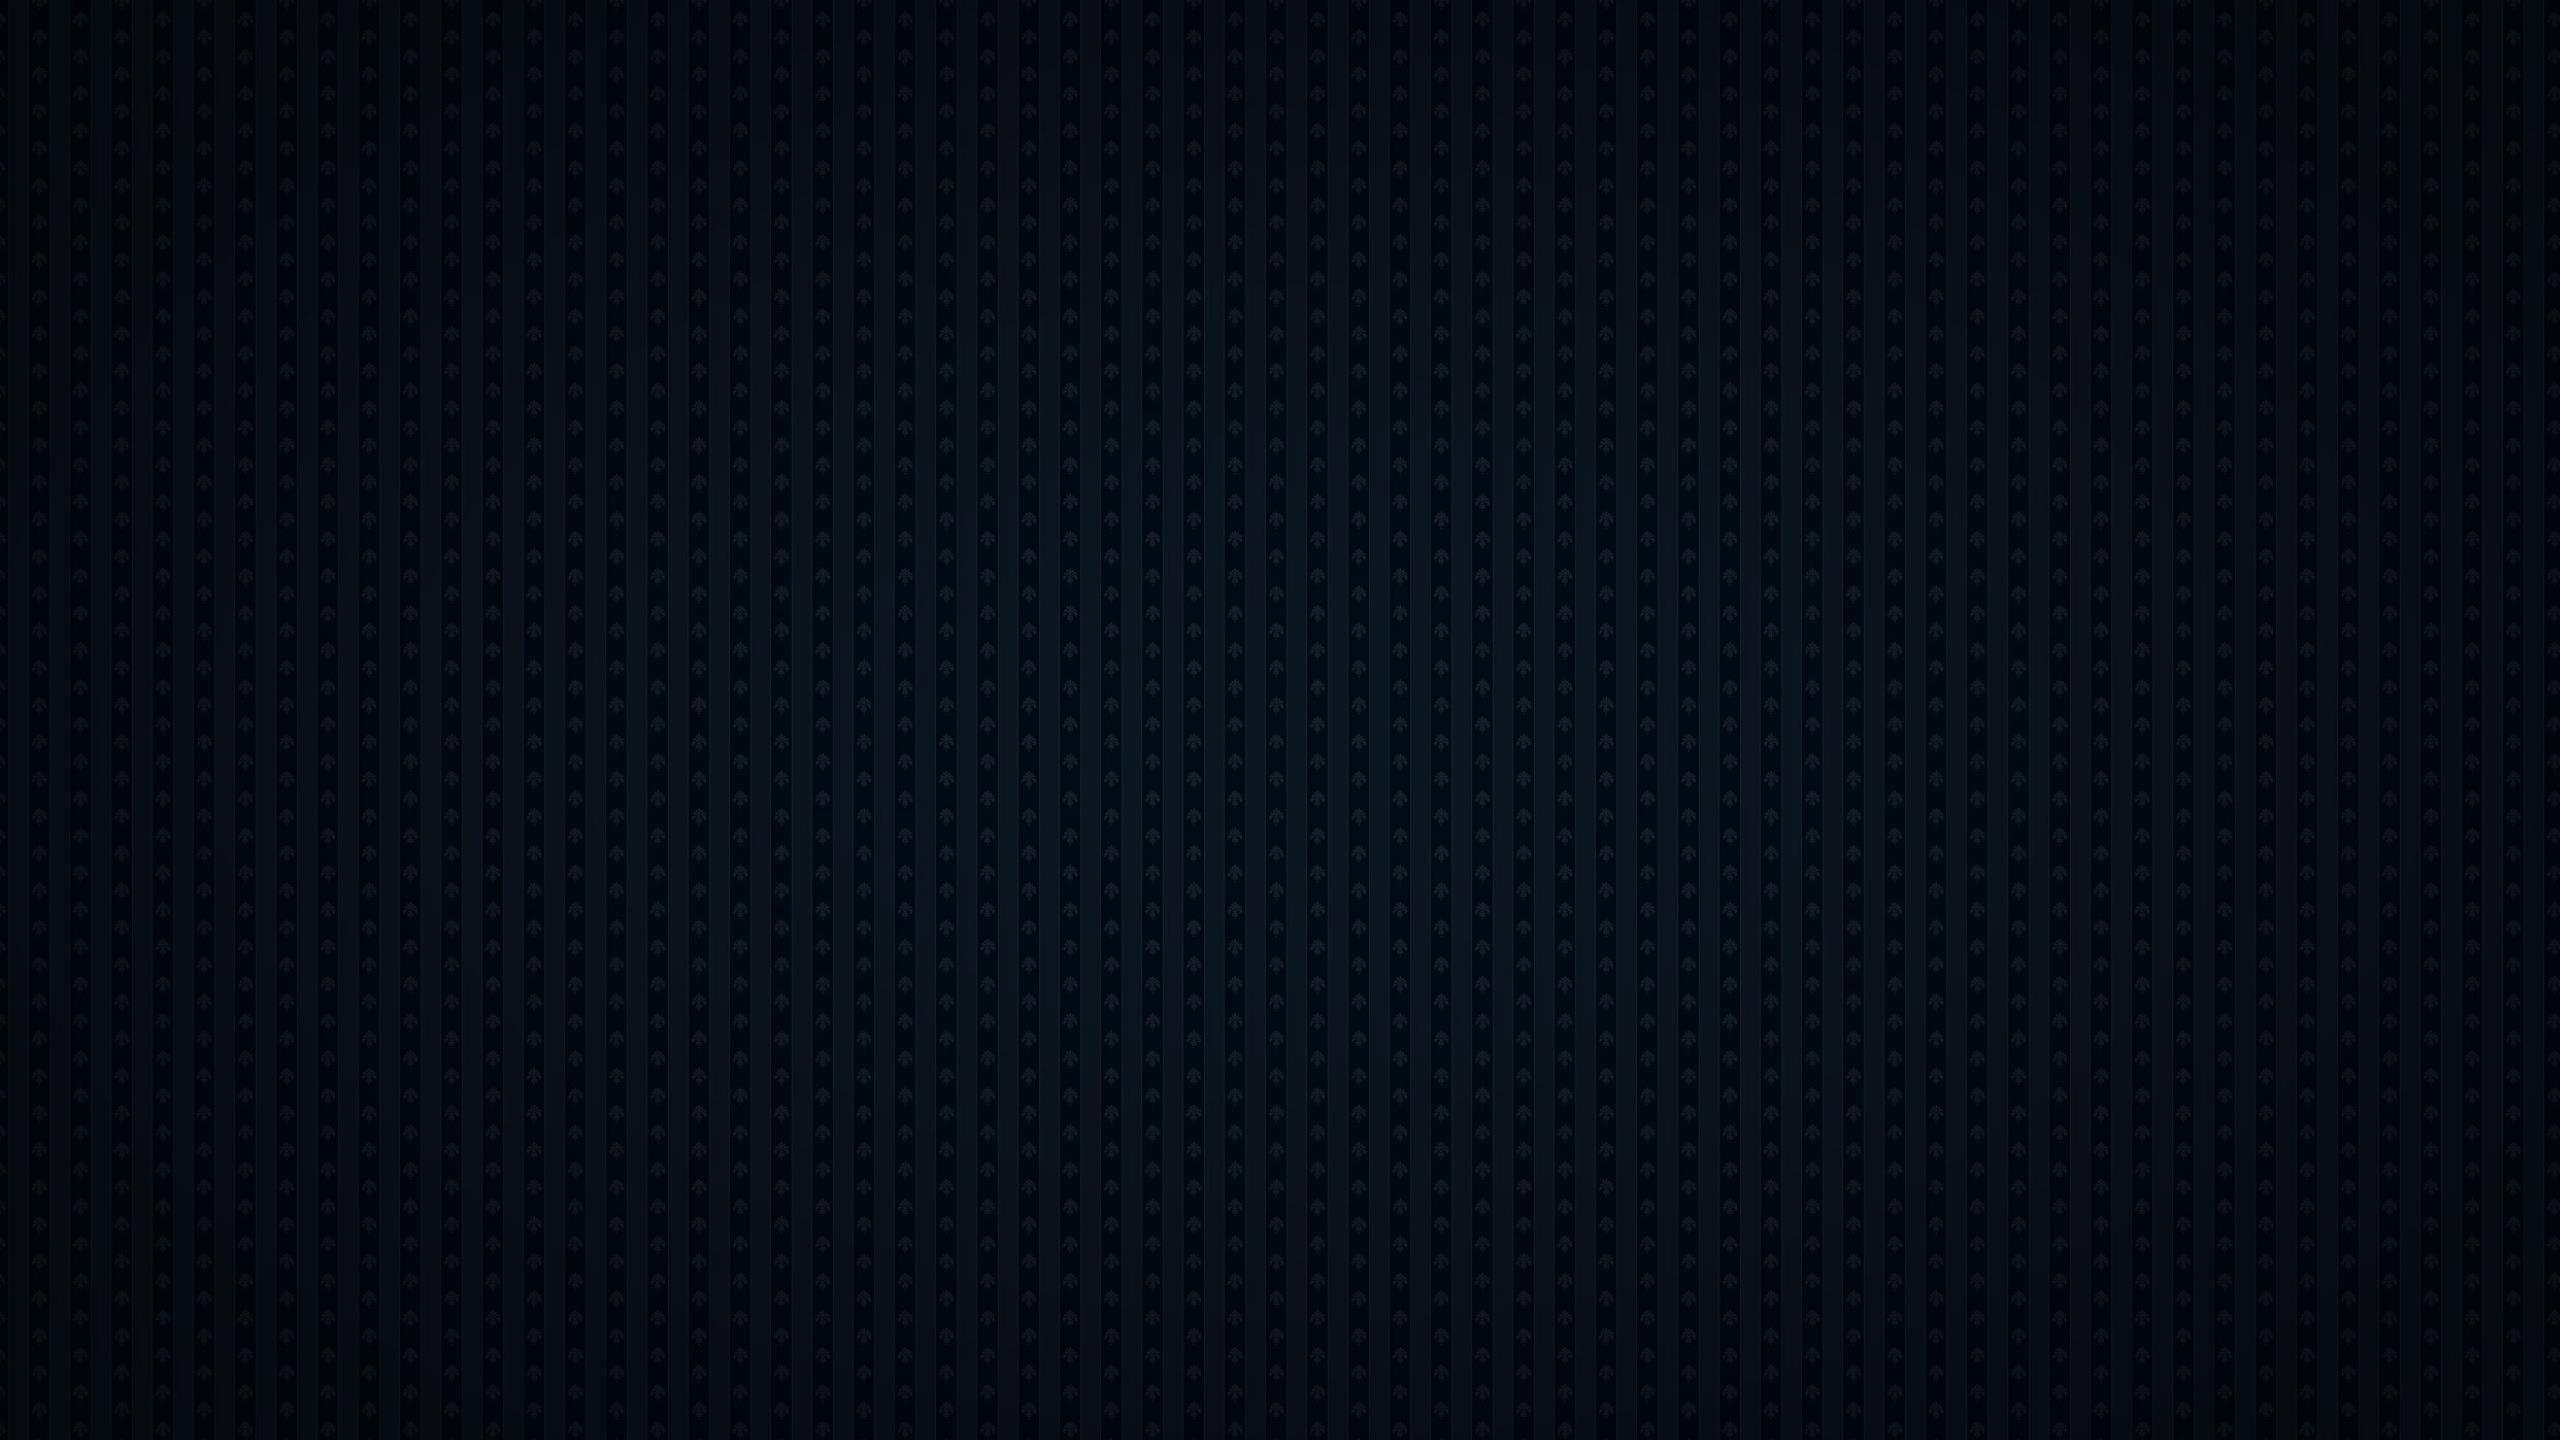 Dark Blue Background Wallpaper (64+ images)